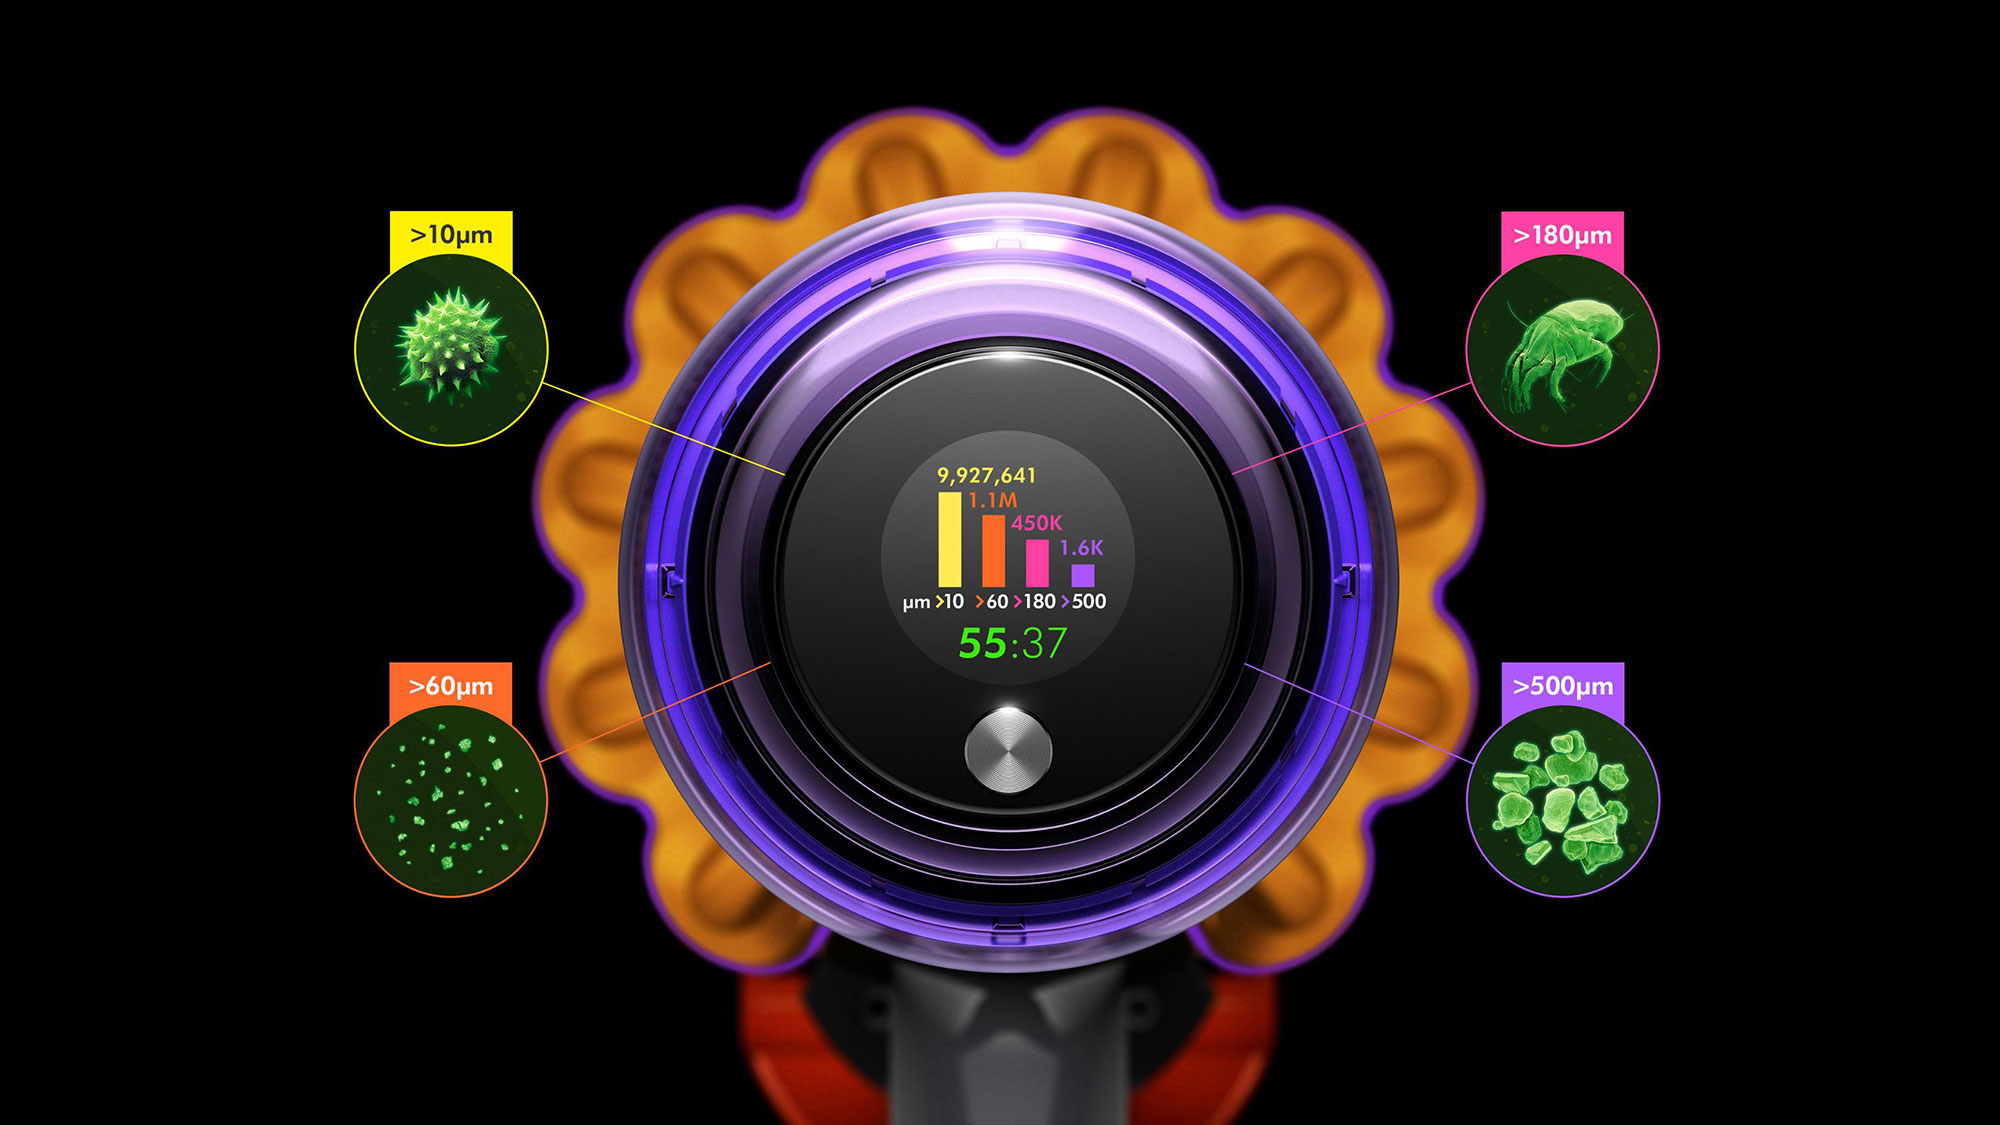 Dyson V15 Detect Cordless Stick Vacuum